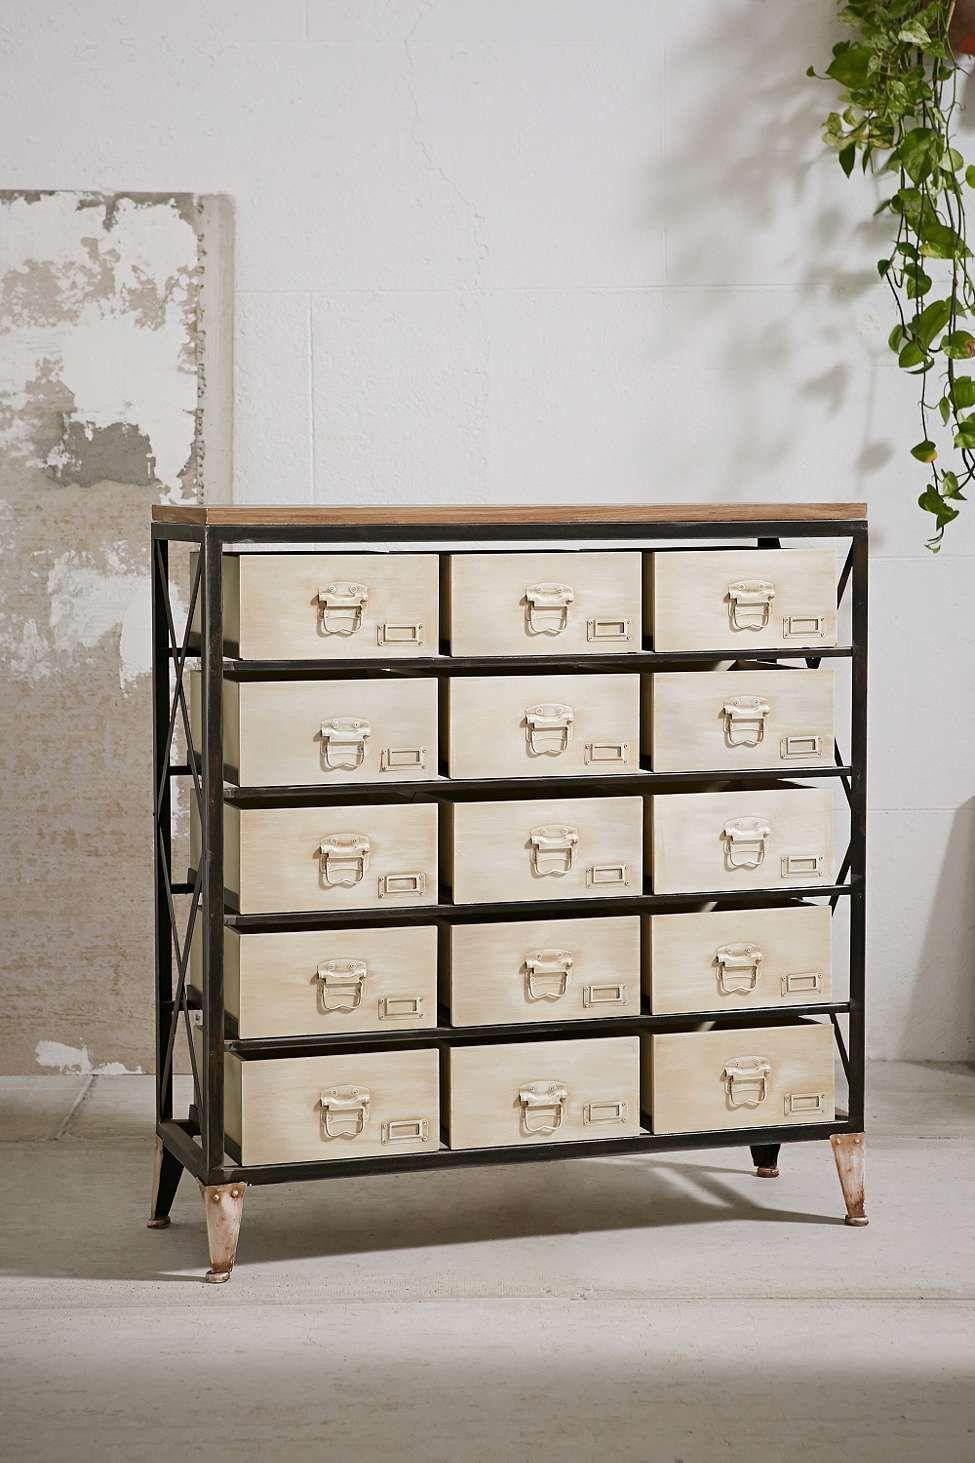 commode industrielle d co pinterest commode industrielle commodes et industriel. Black Bedroom Furniture Sets. Home Design Ideas